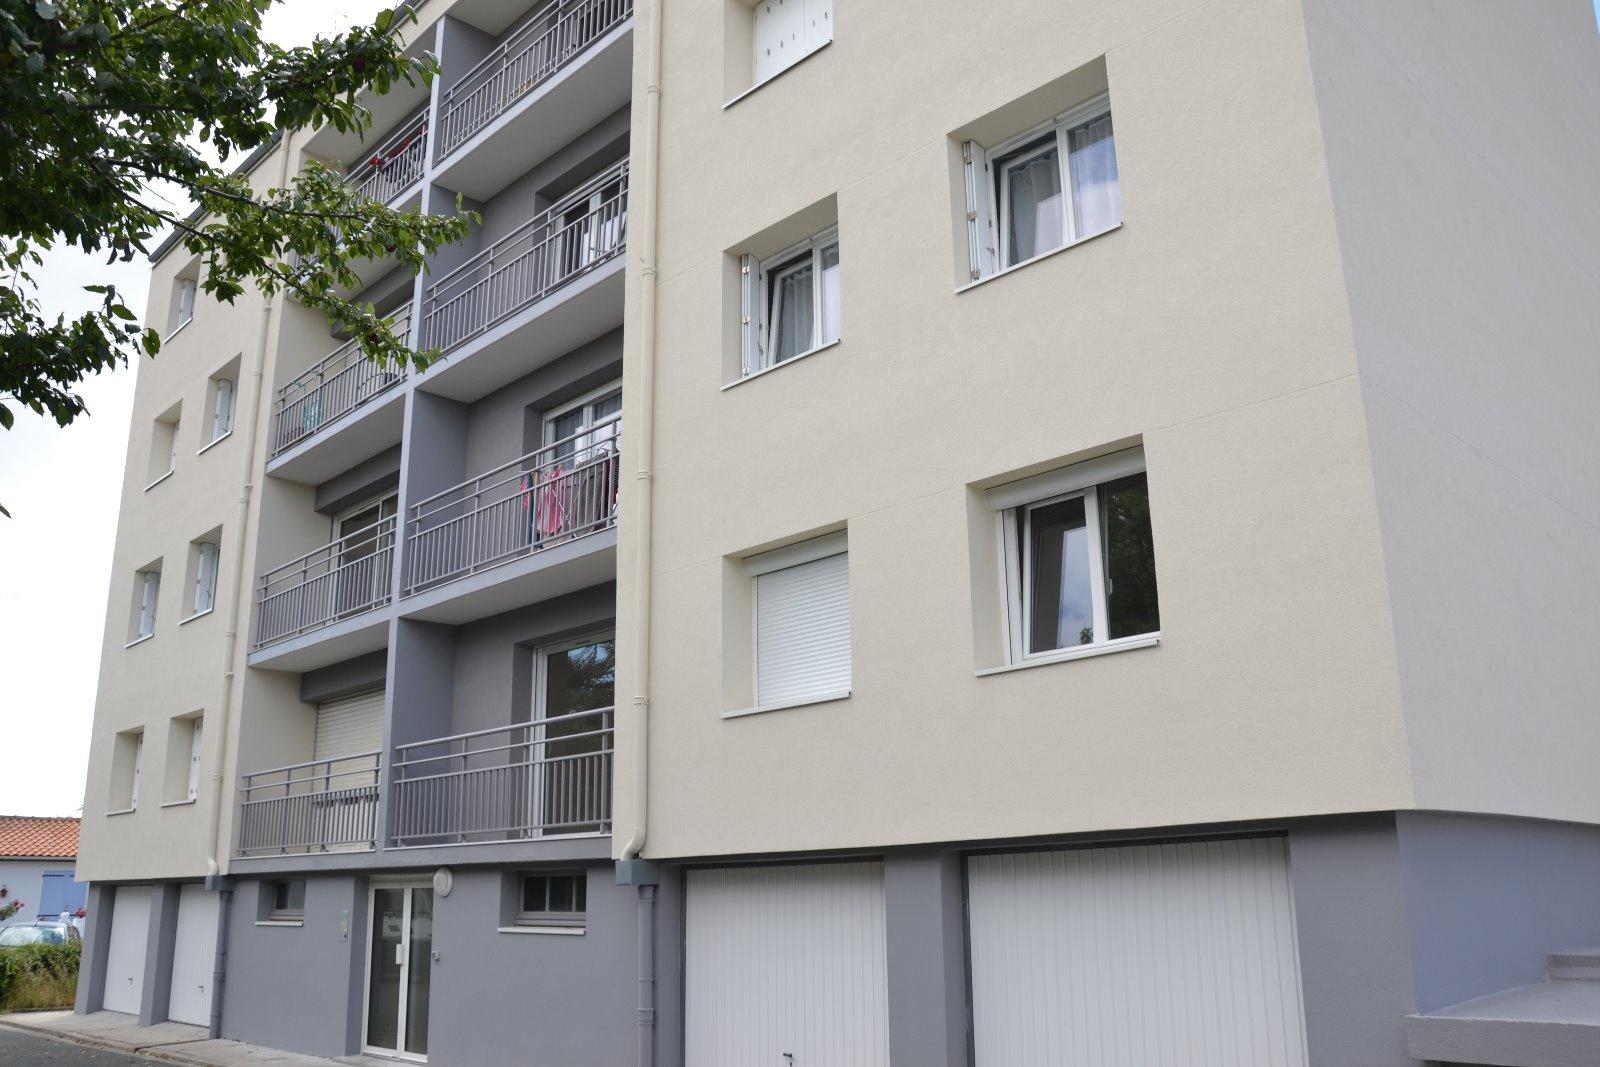 Annonce vente appartement la rochelle 17000 67 m 181 for Annonce vente appartement